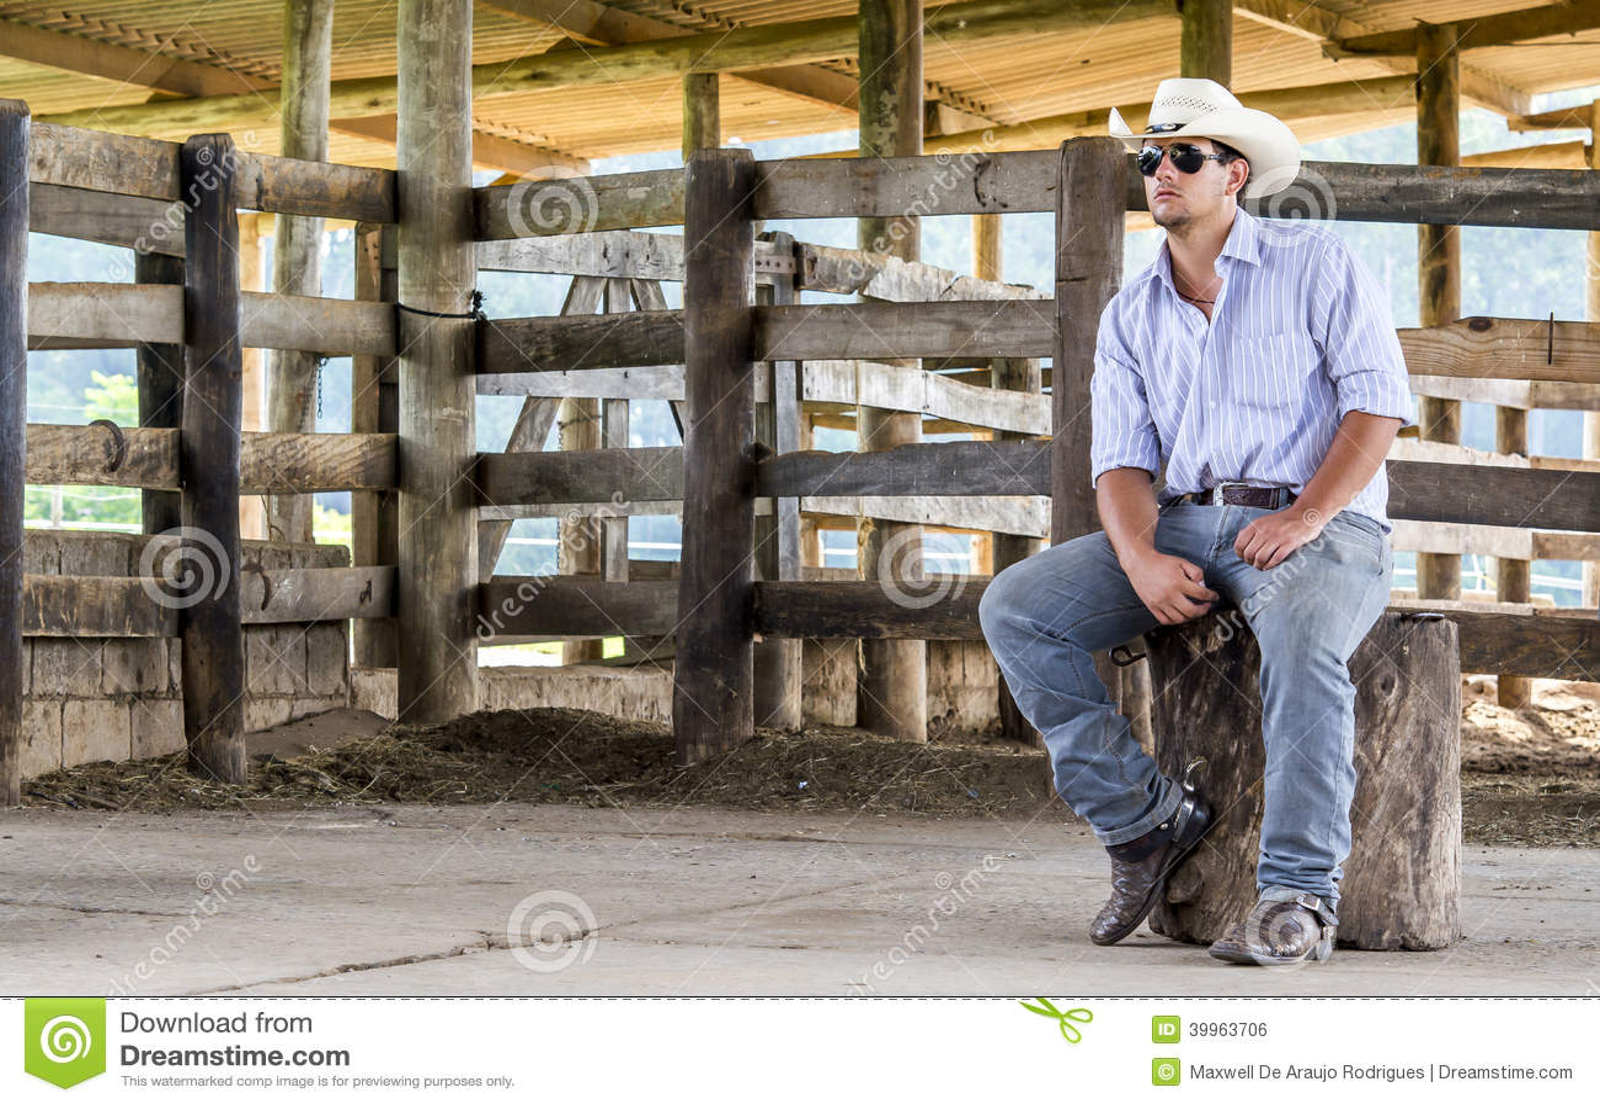 Cowboy assis